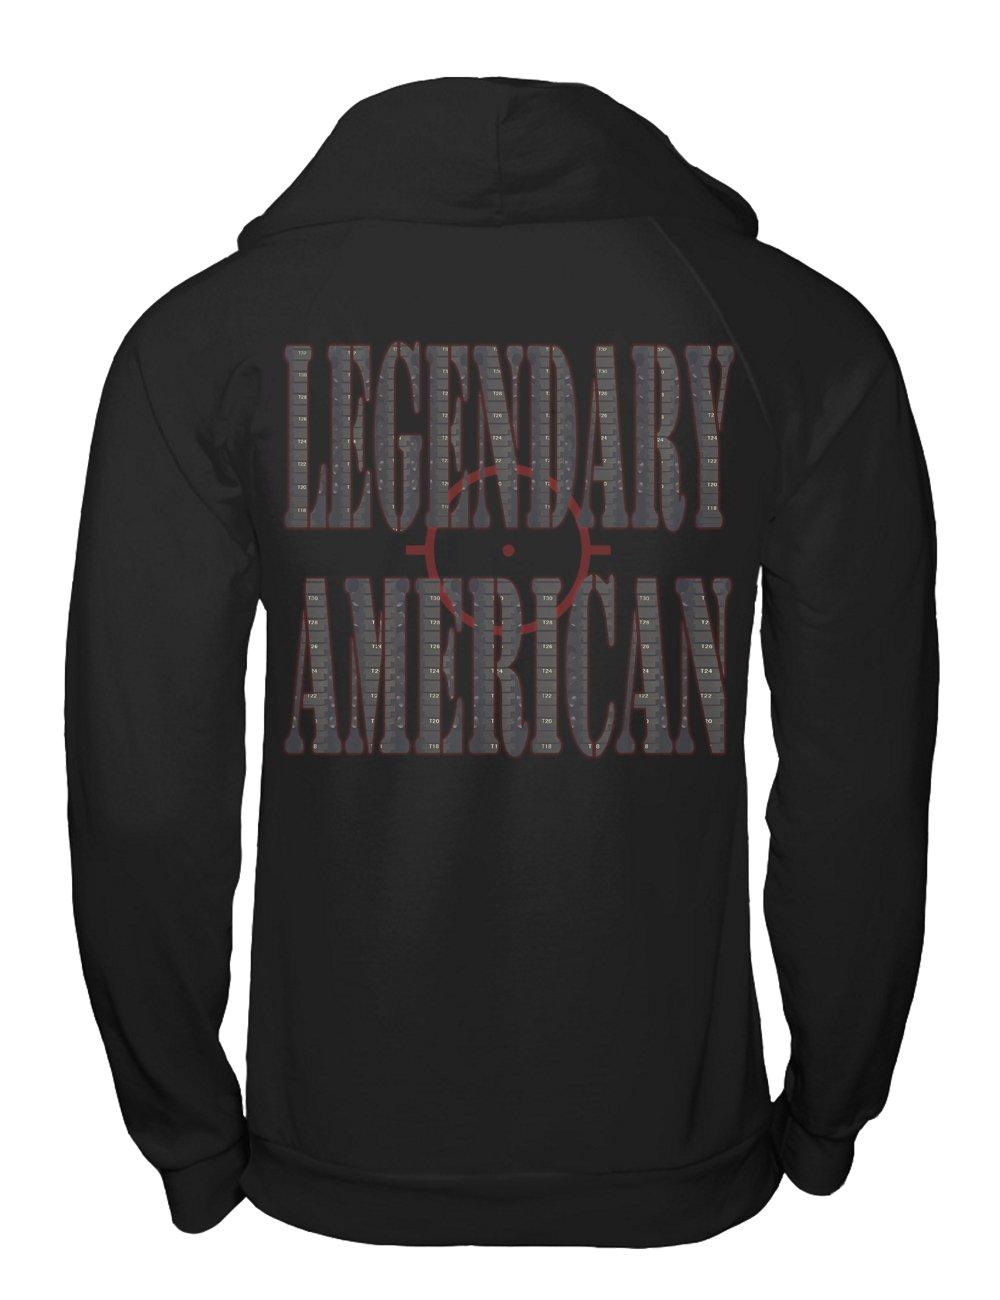 Image of Legendary American M4 pullover hoodie